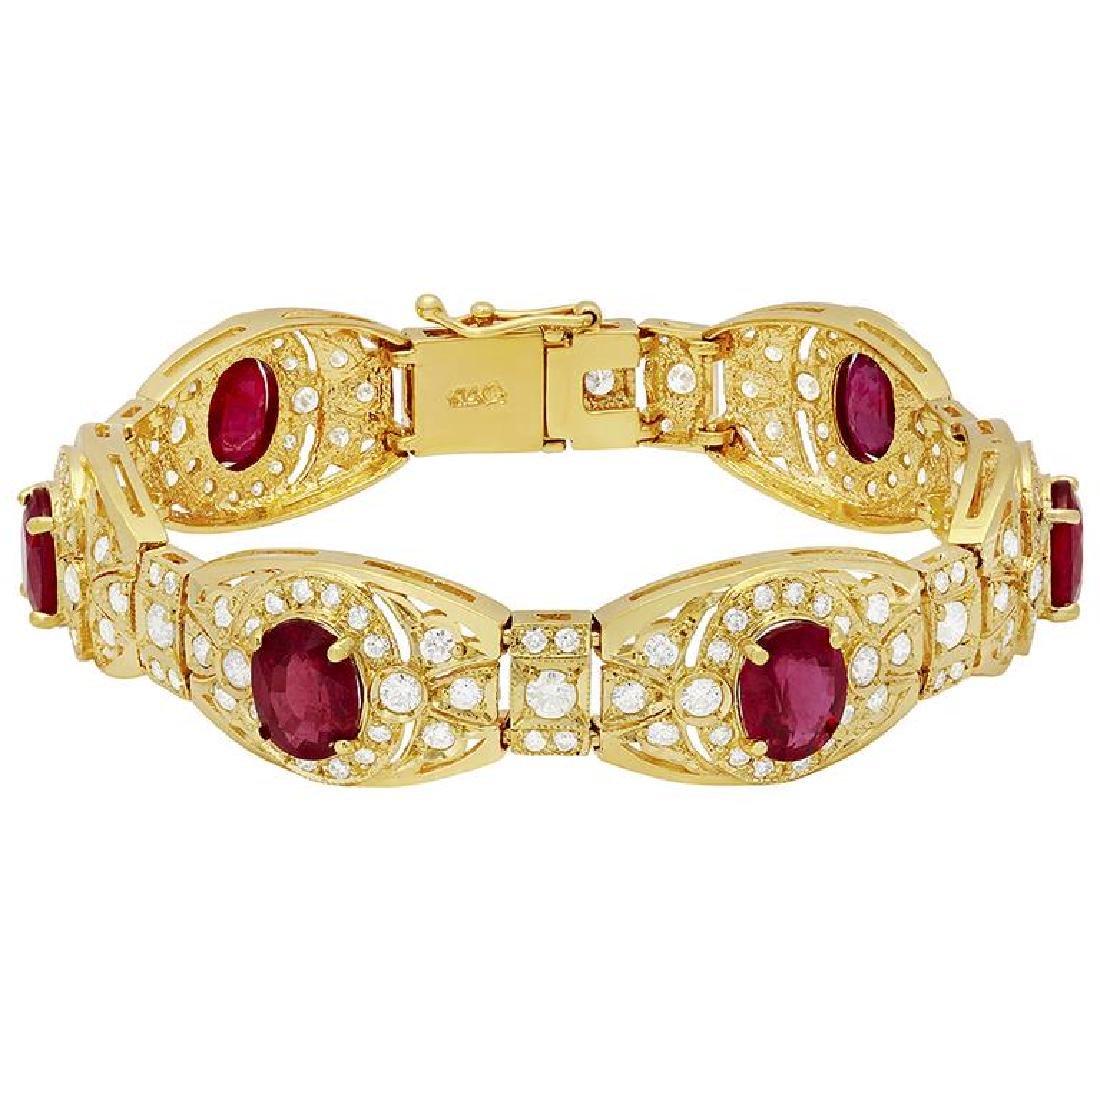 14k Yellow Gold 18.11ct Ruby 6.72ct Diamond Bracelet